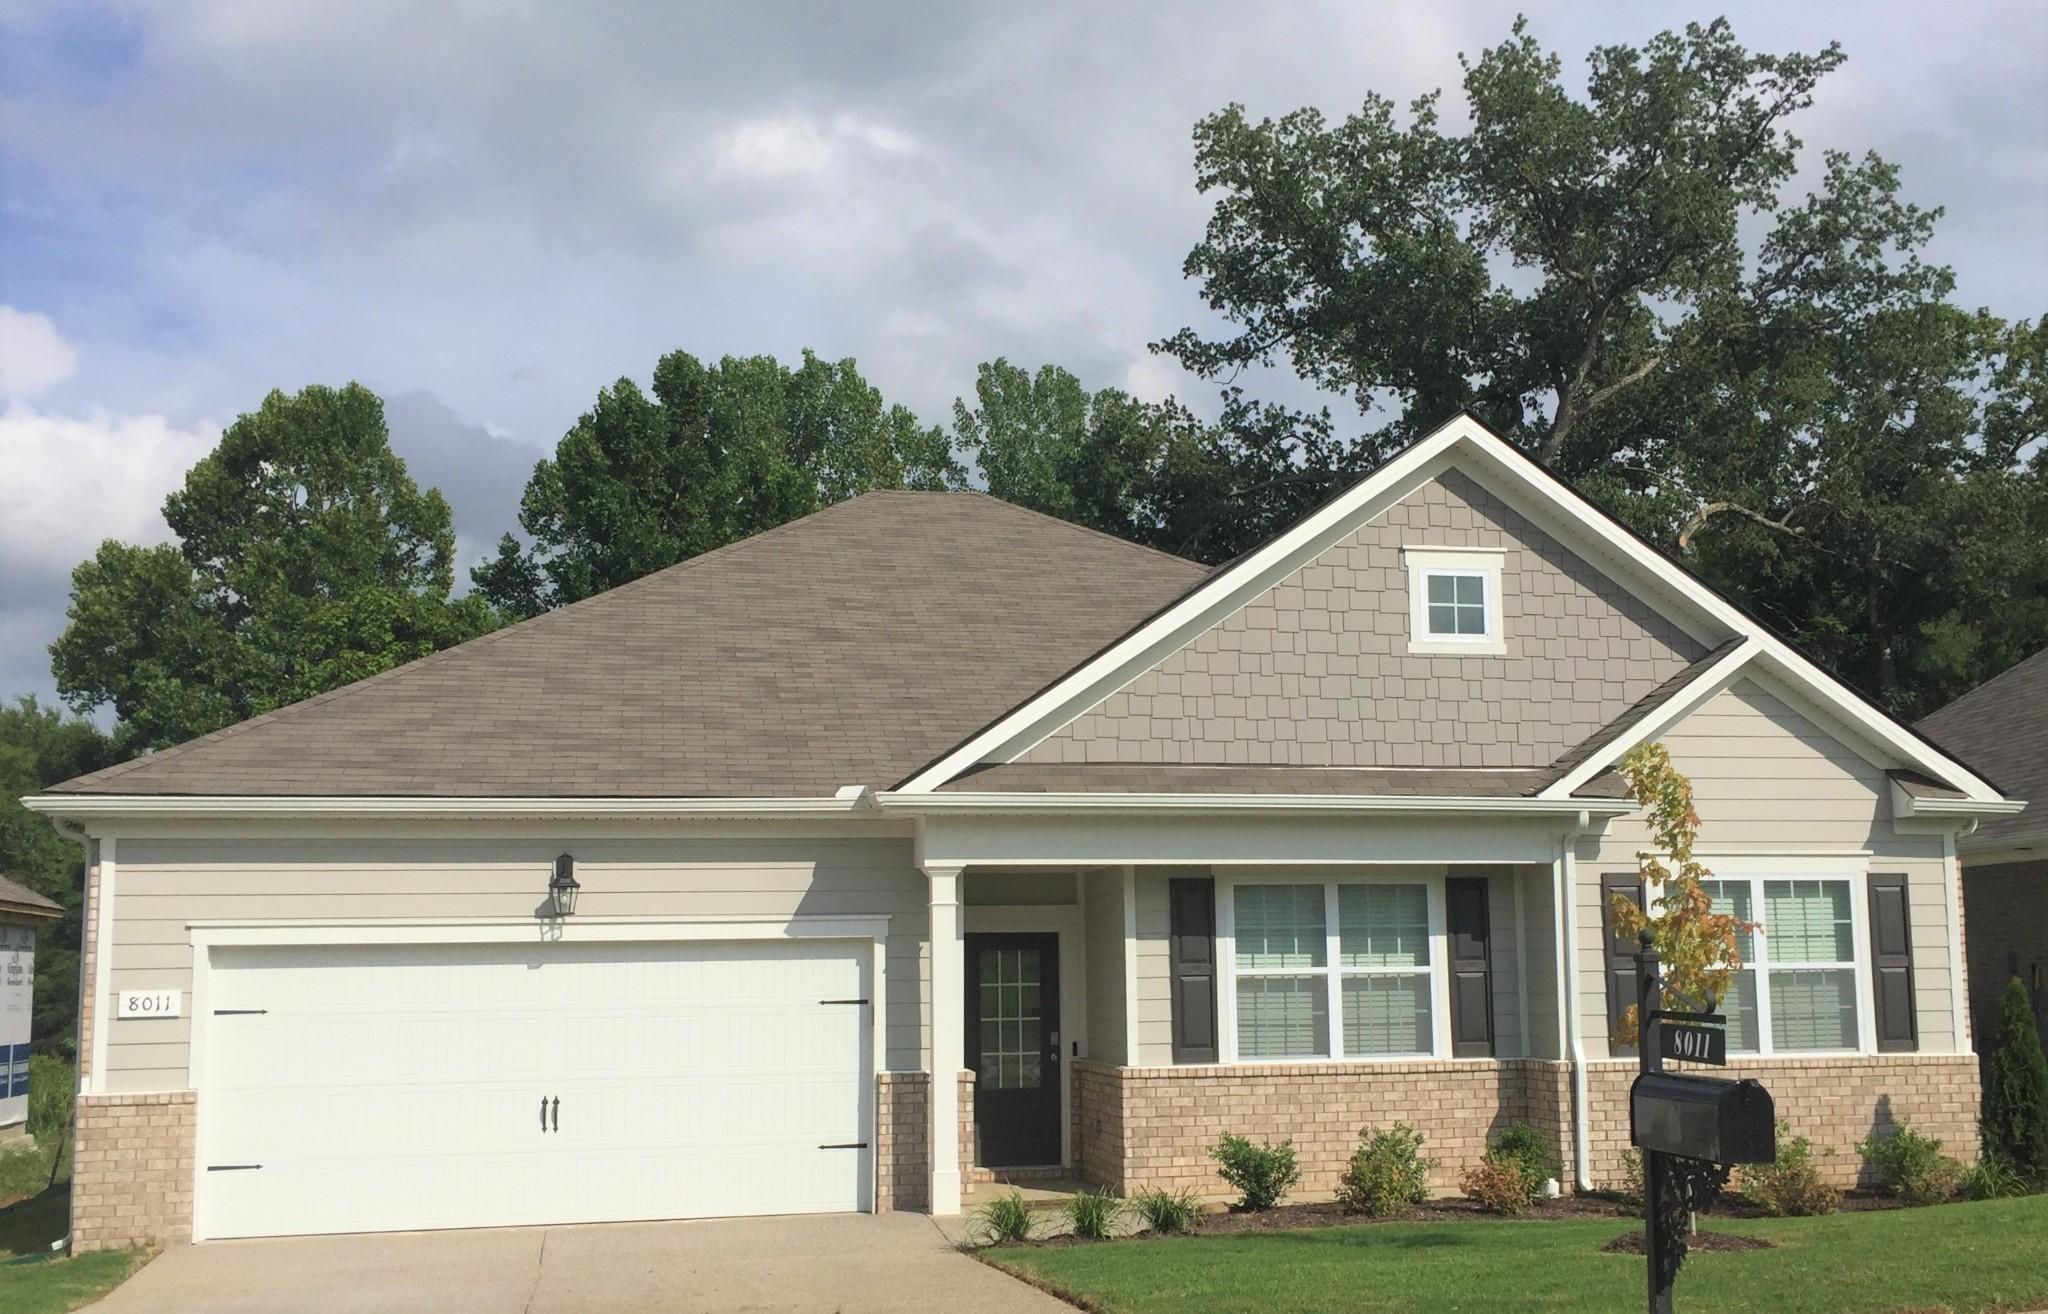 1027 Alta Vista Lane, #11 Property Photo - Smyrna, TN real estate listing